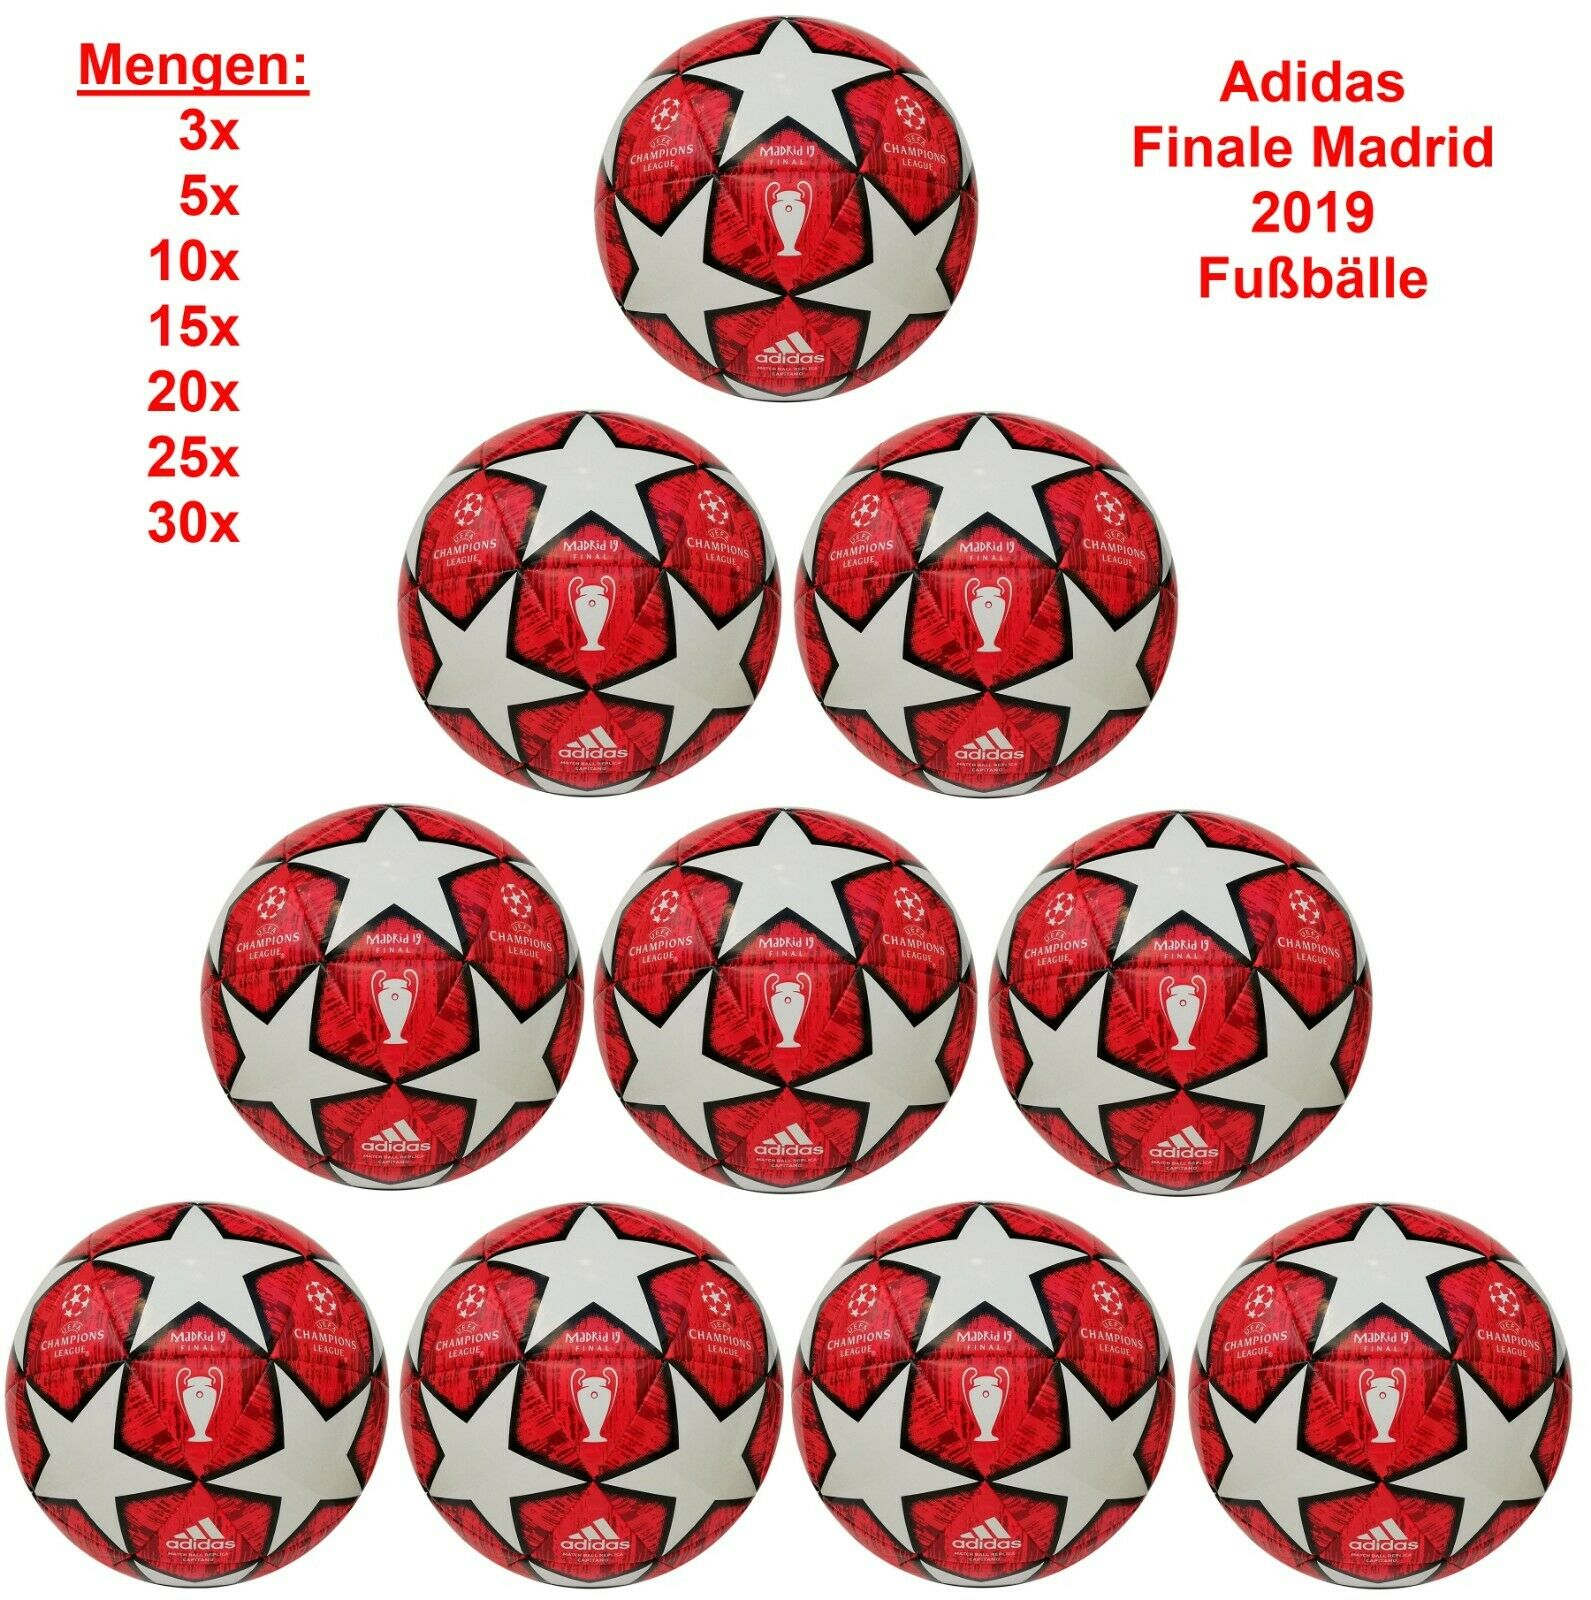 Adidas Capitano Madrid 2019 Finale 19 Trainingsbälle Champions League Ballpaket